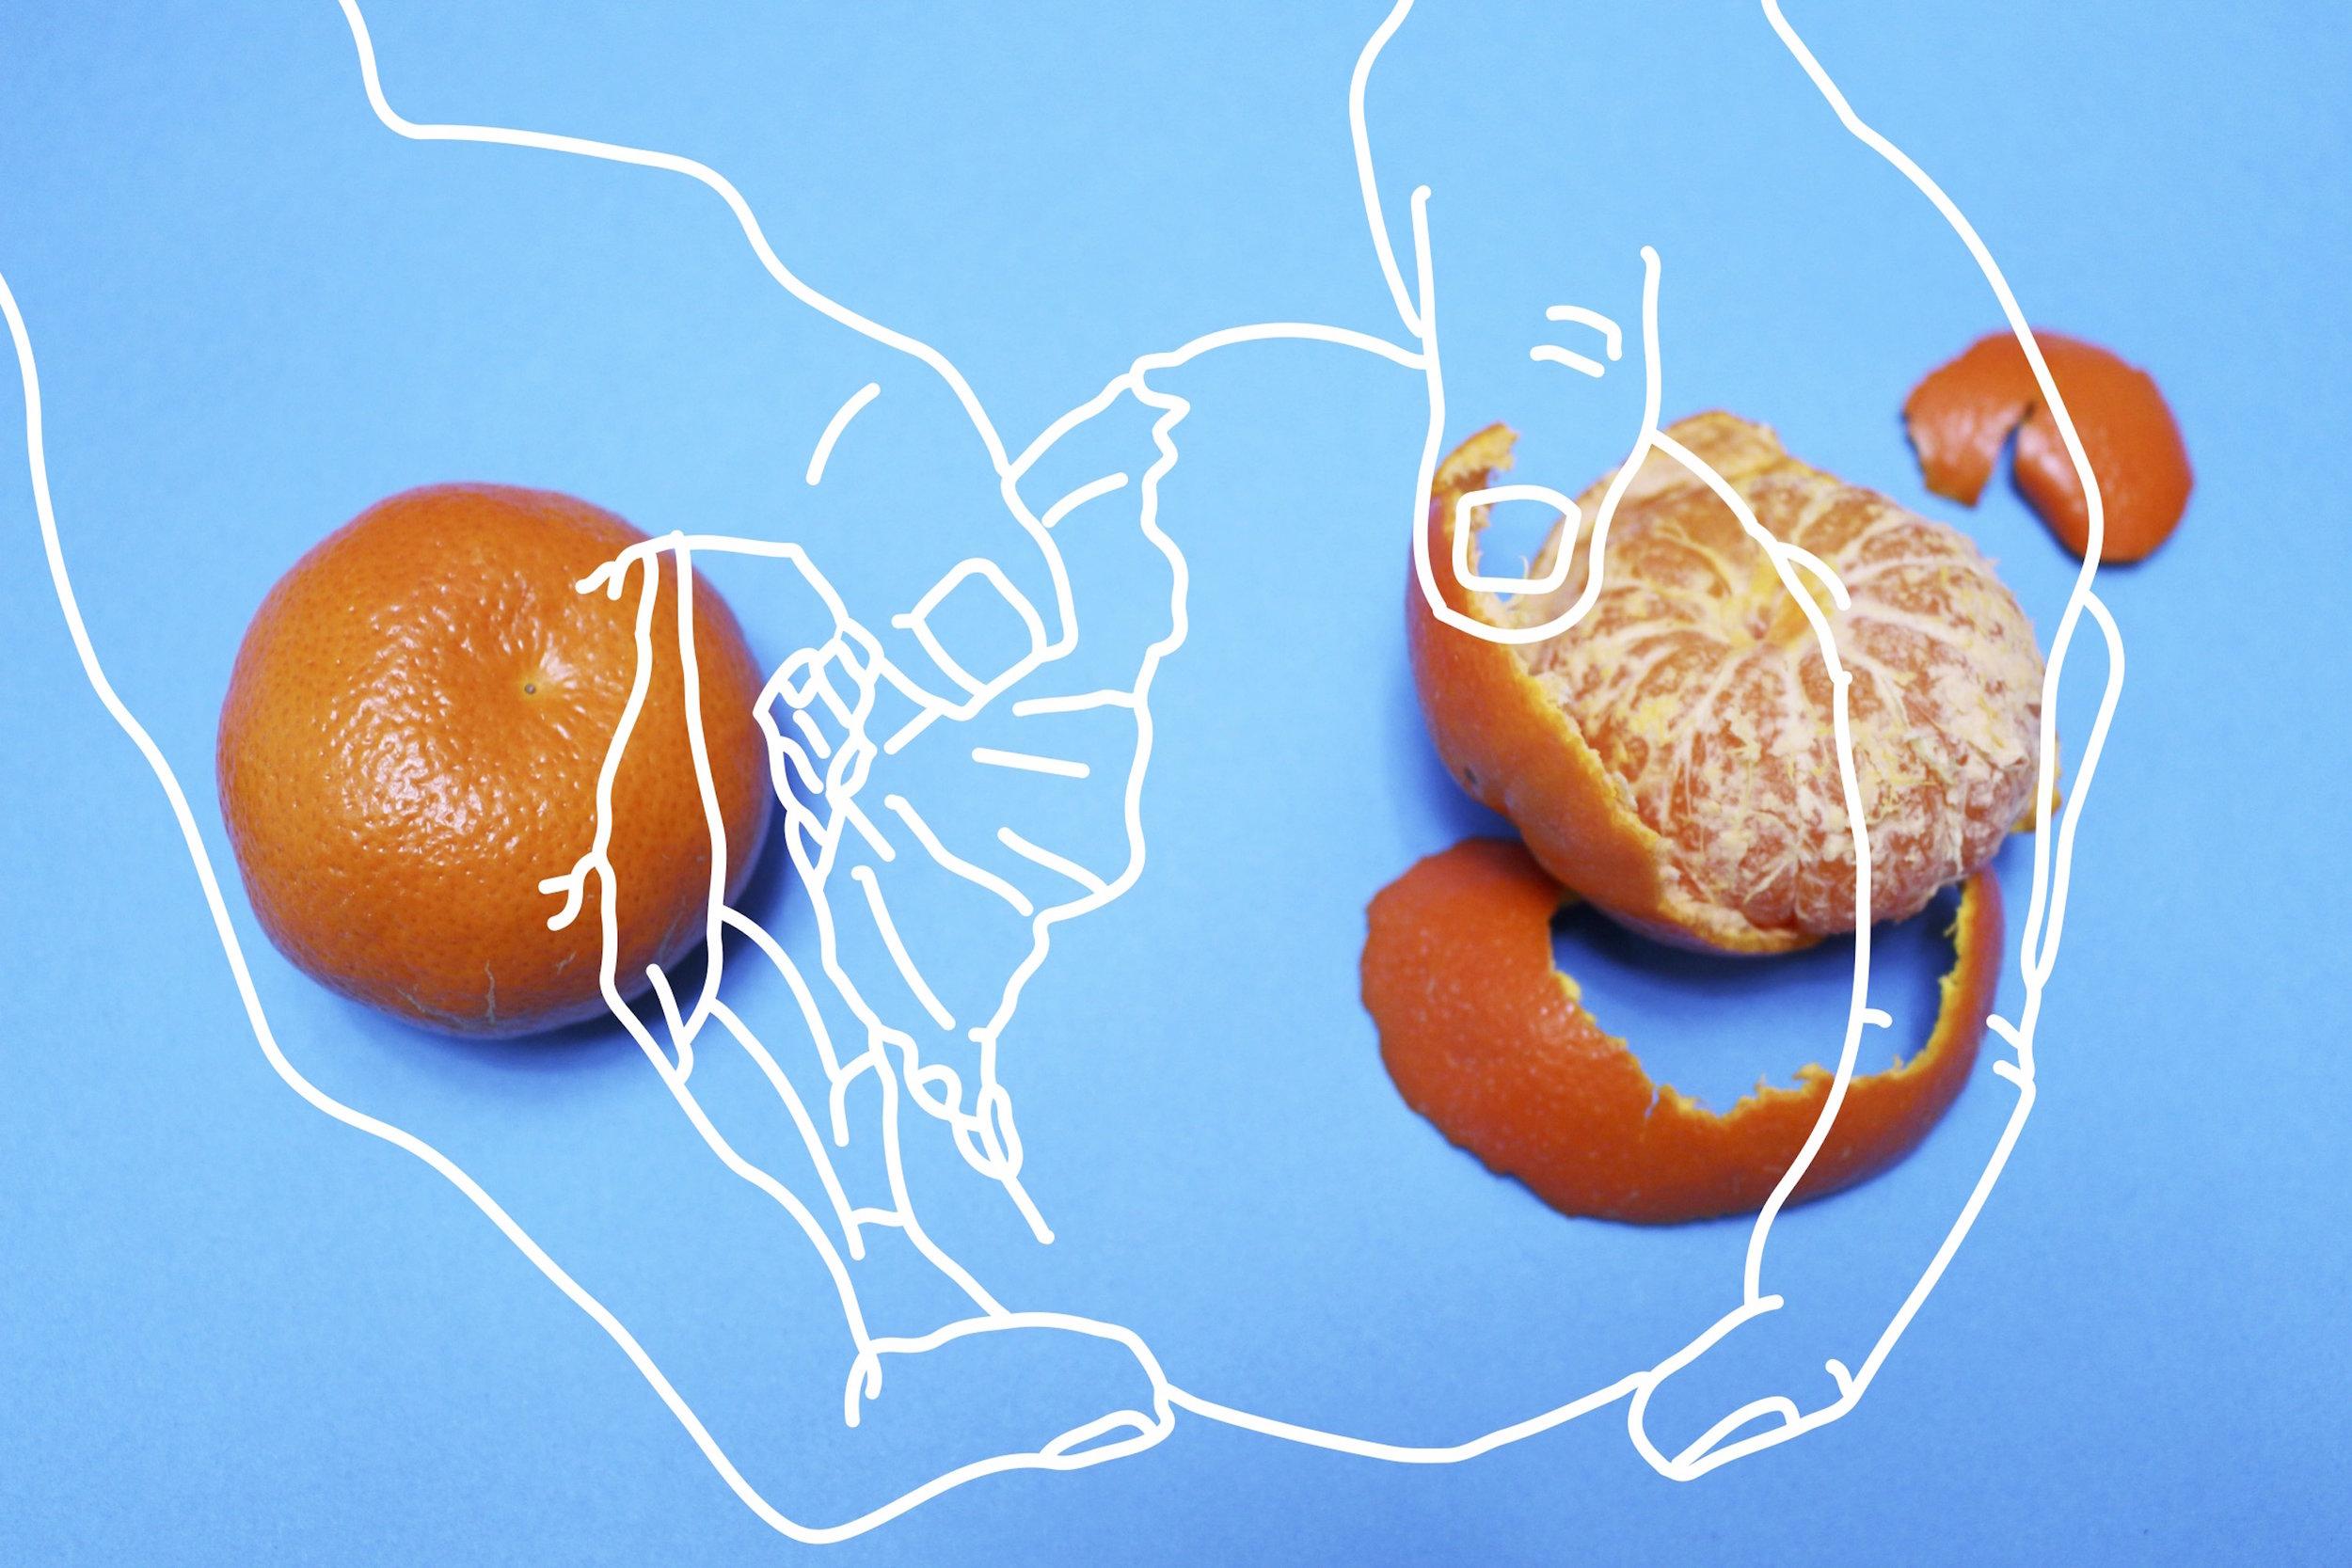 peelingtheorange.jpg